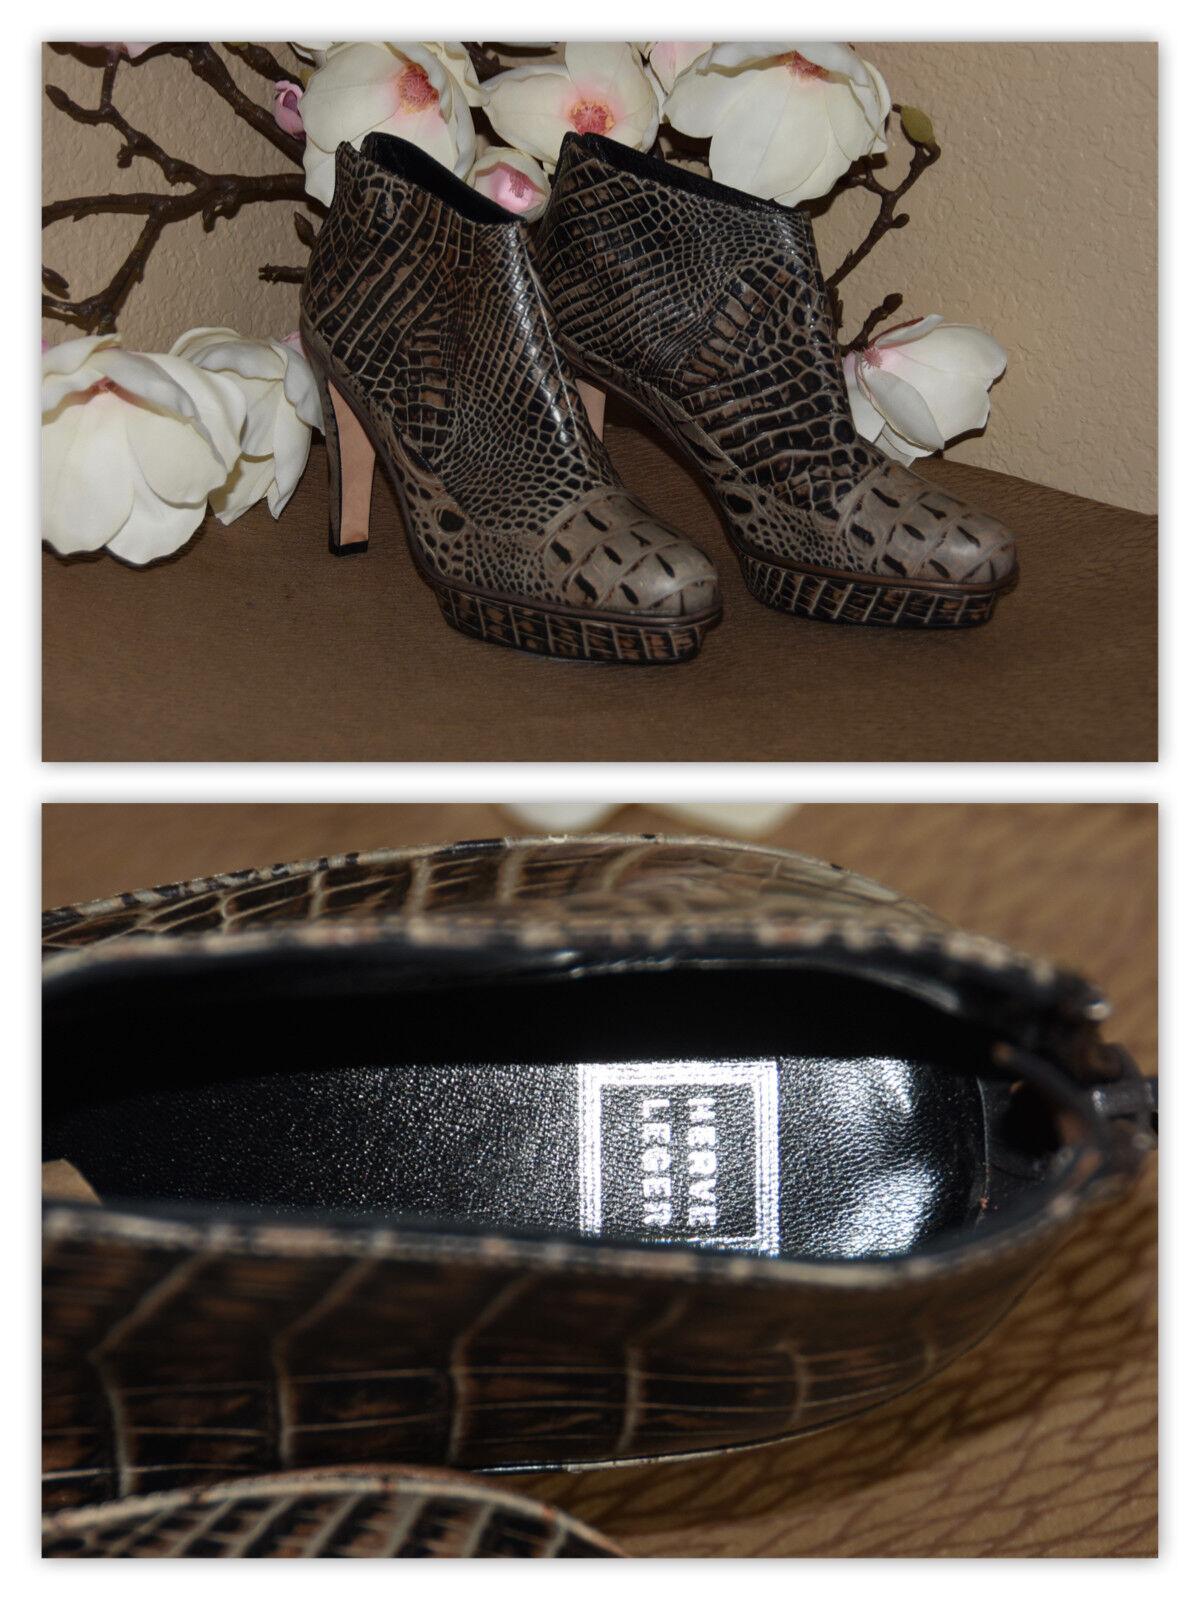 Herve Leger Crocodile Print Stiletto Ankle Platform Leather Boots Size 10 - 40